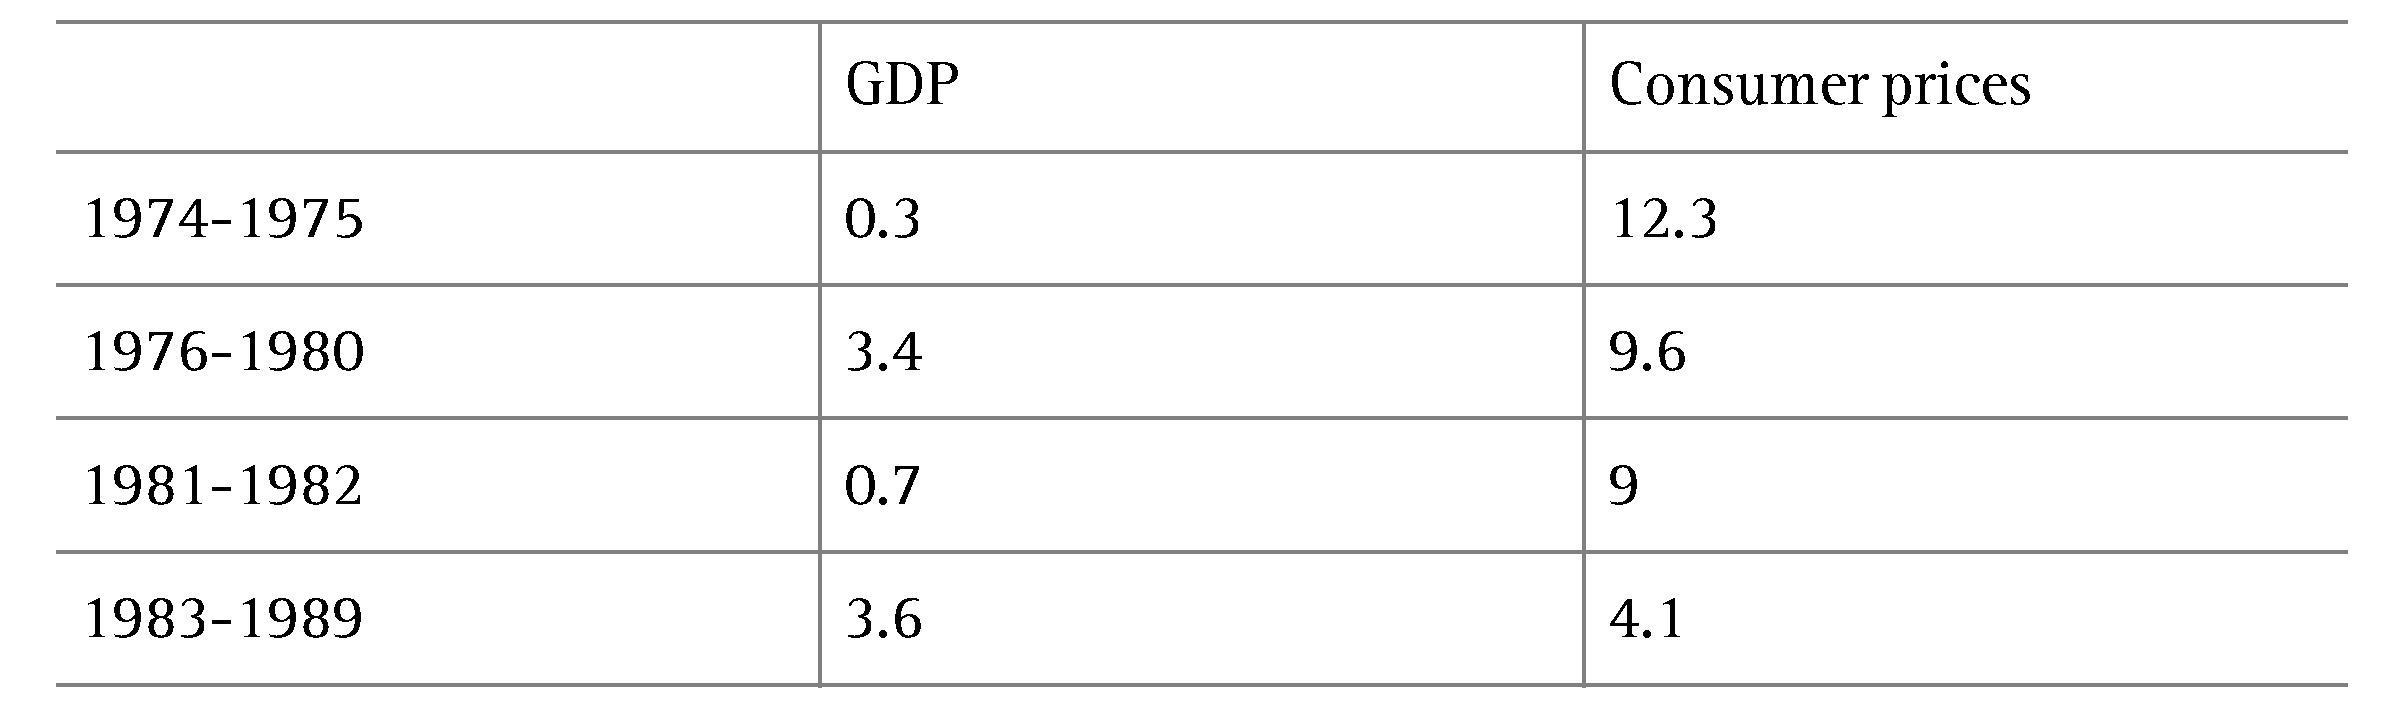 Chapitre 1 - European inflation, 1973-1983 | Cairn info